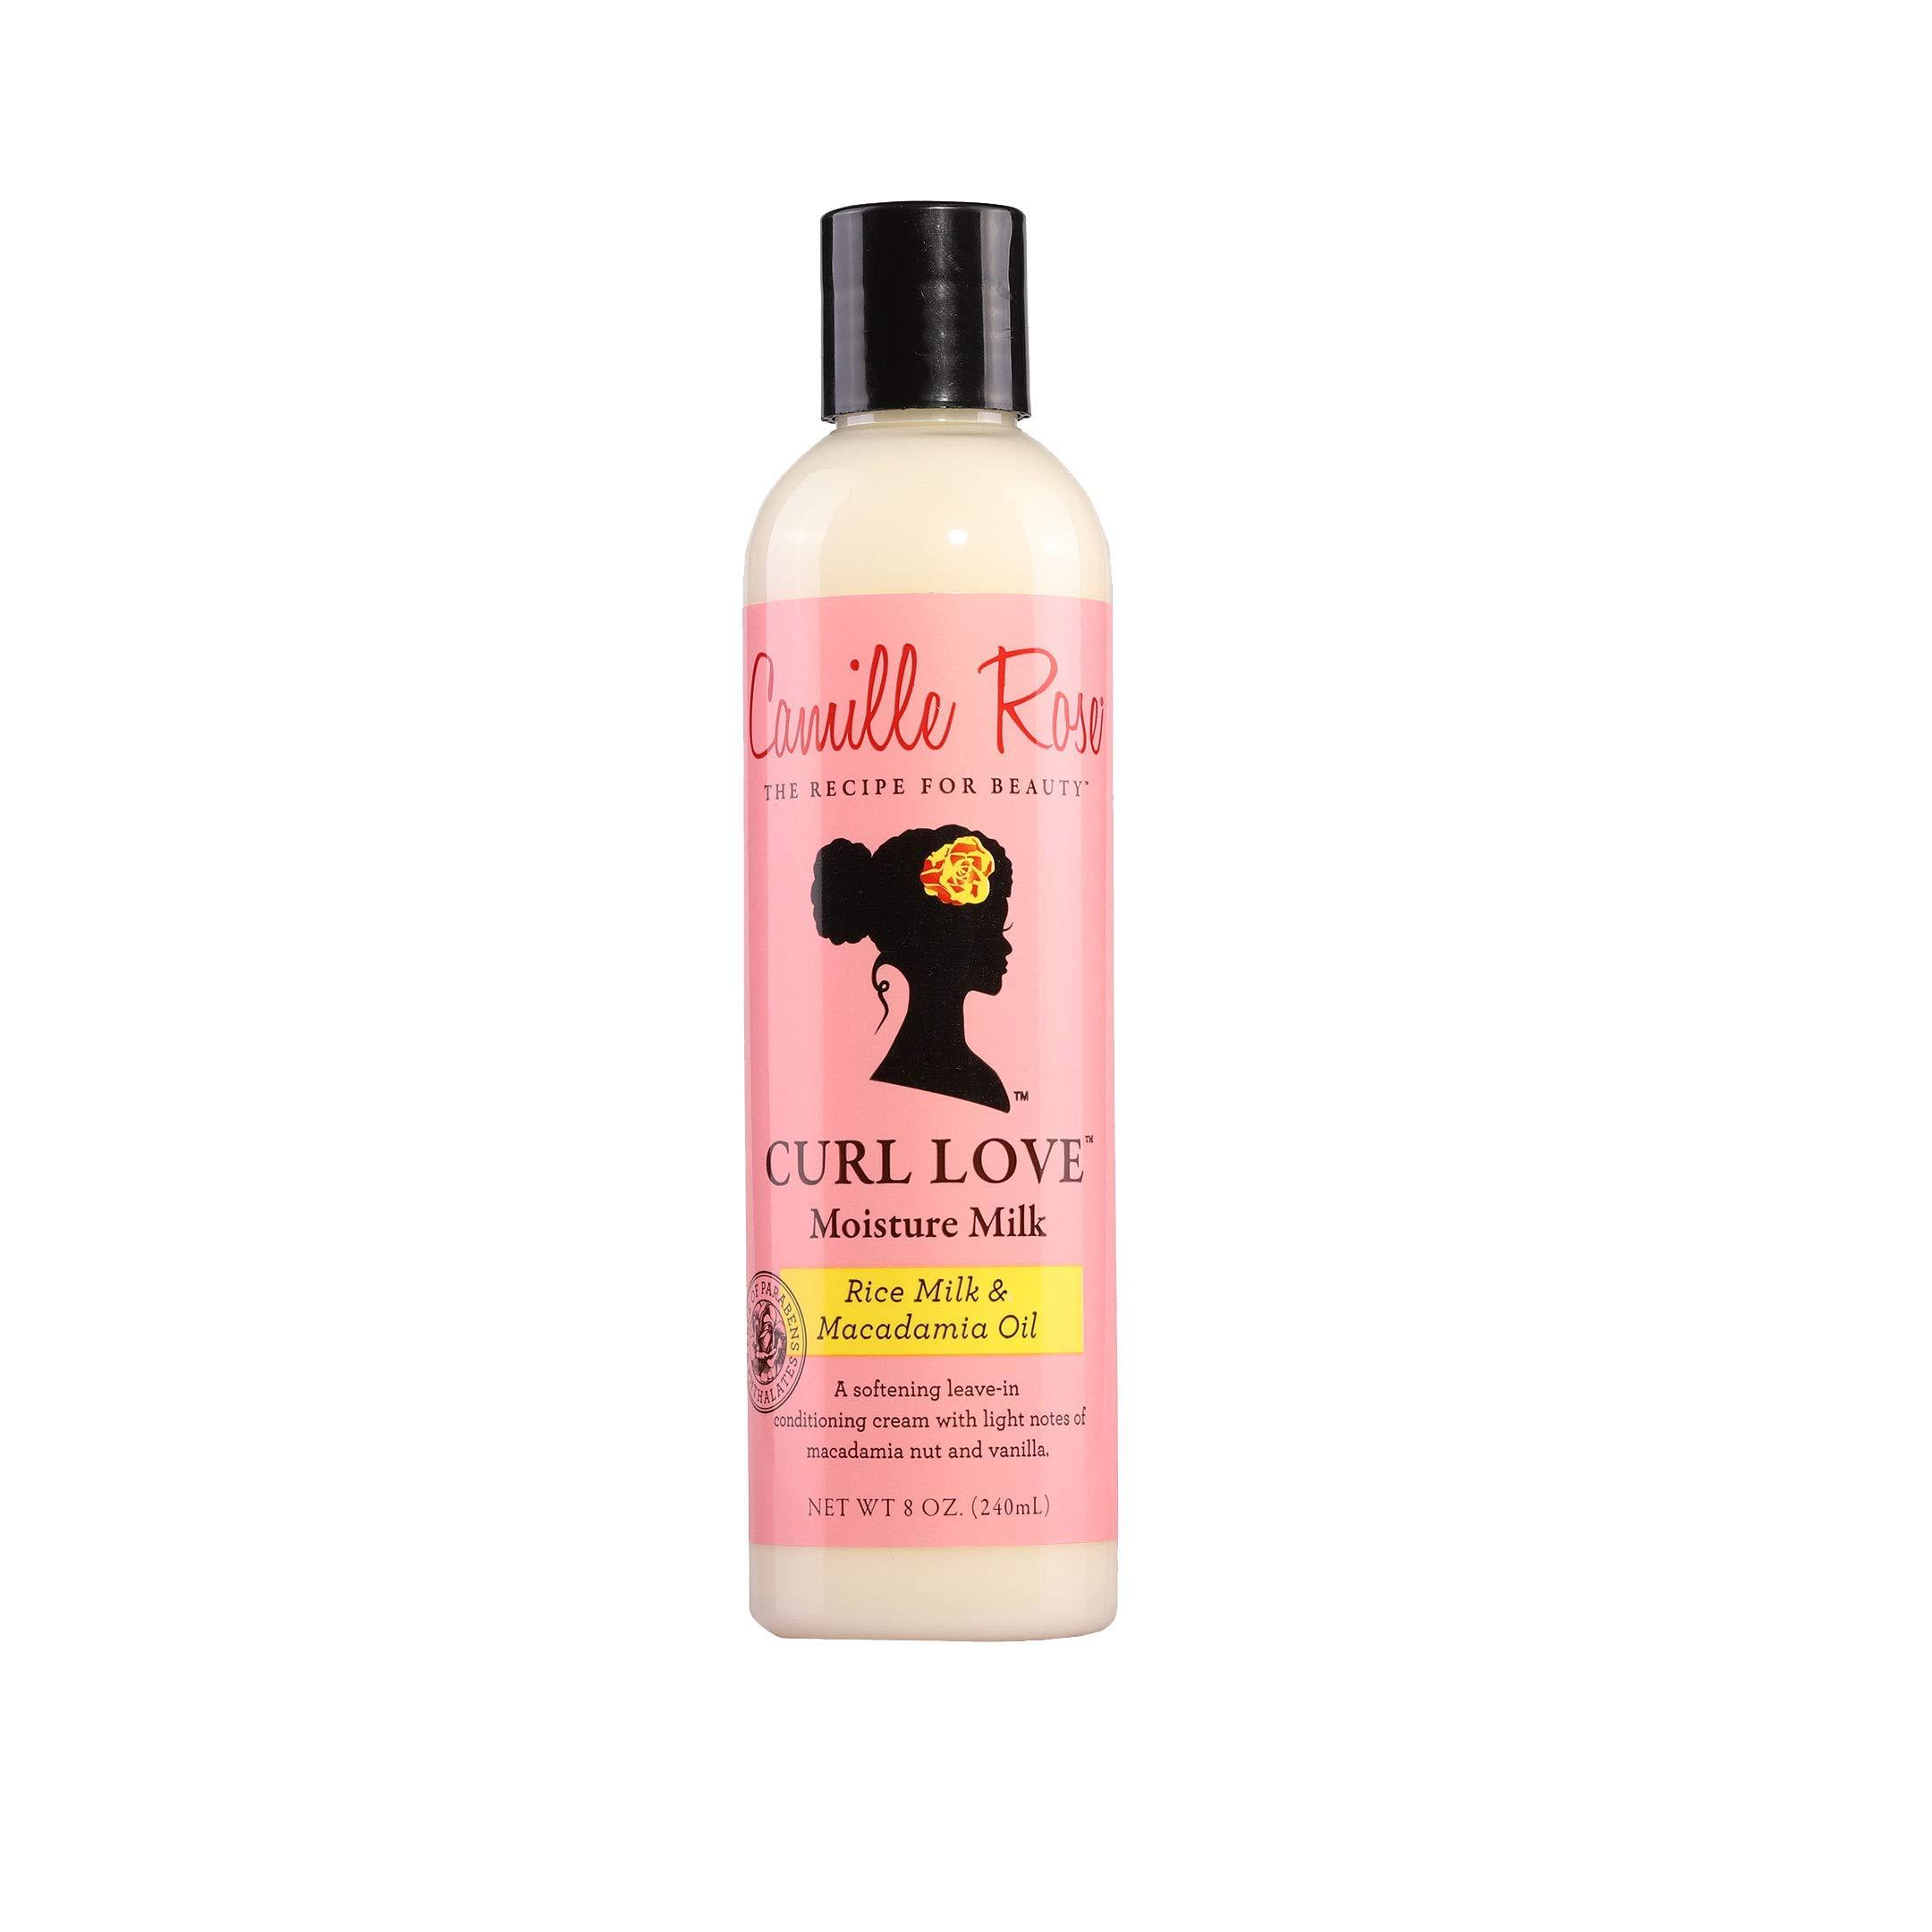 Camille Rose Curl Love Moisture Milk, 8 fl oz